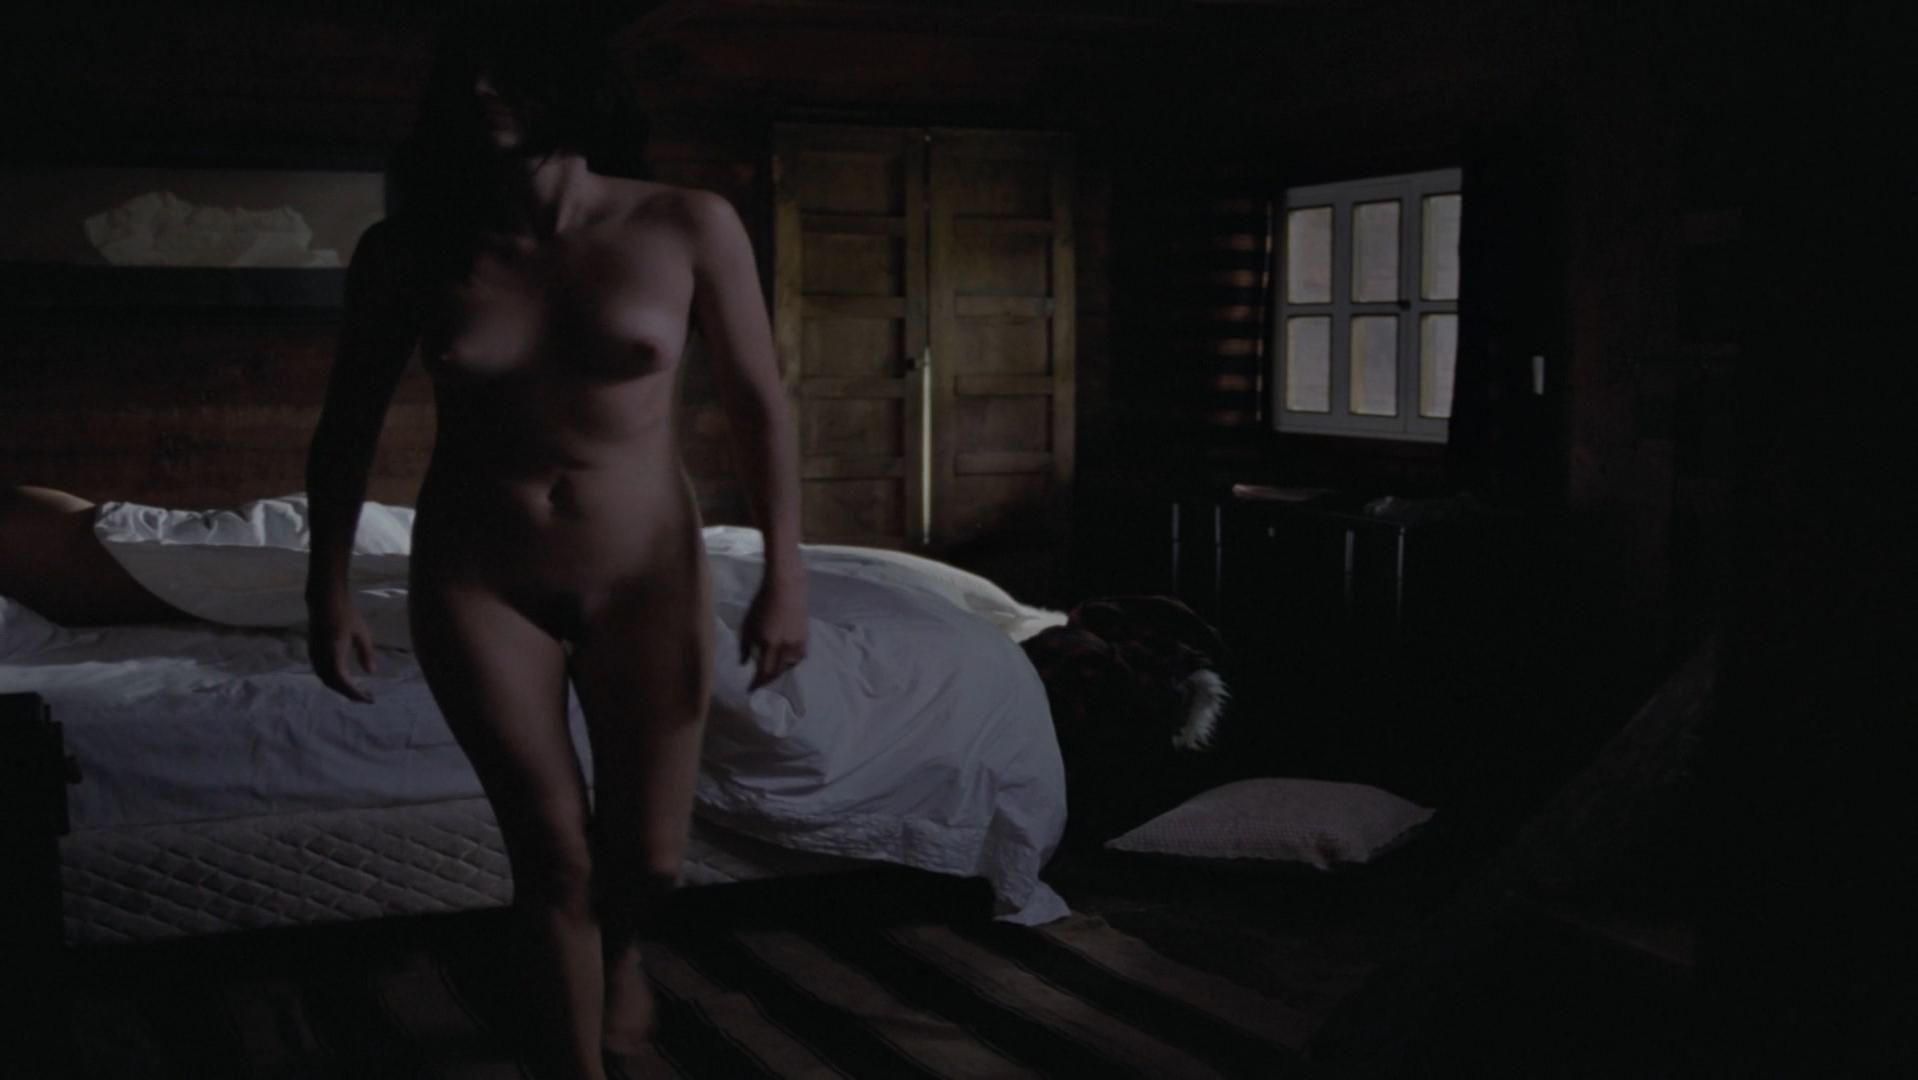 Nathalia Acevedo nude - Post Teneunderwears Lux (2012)